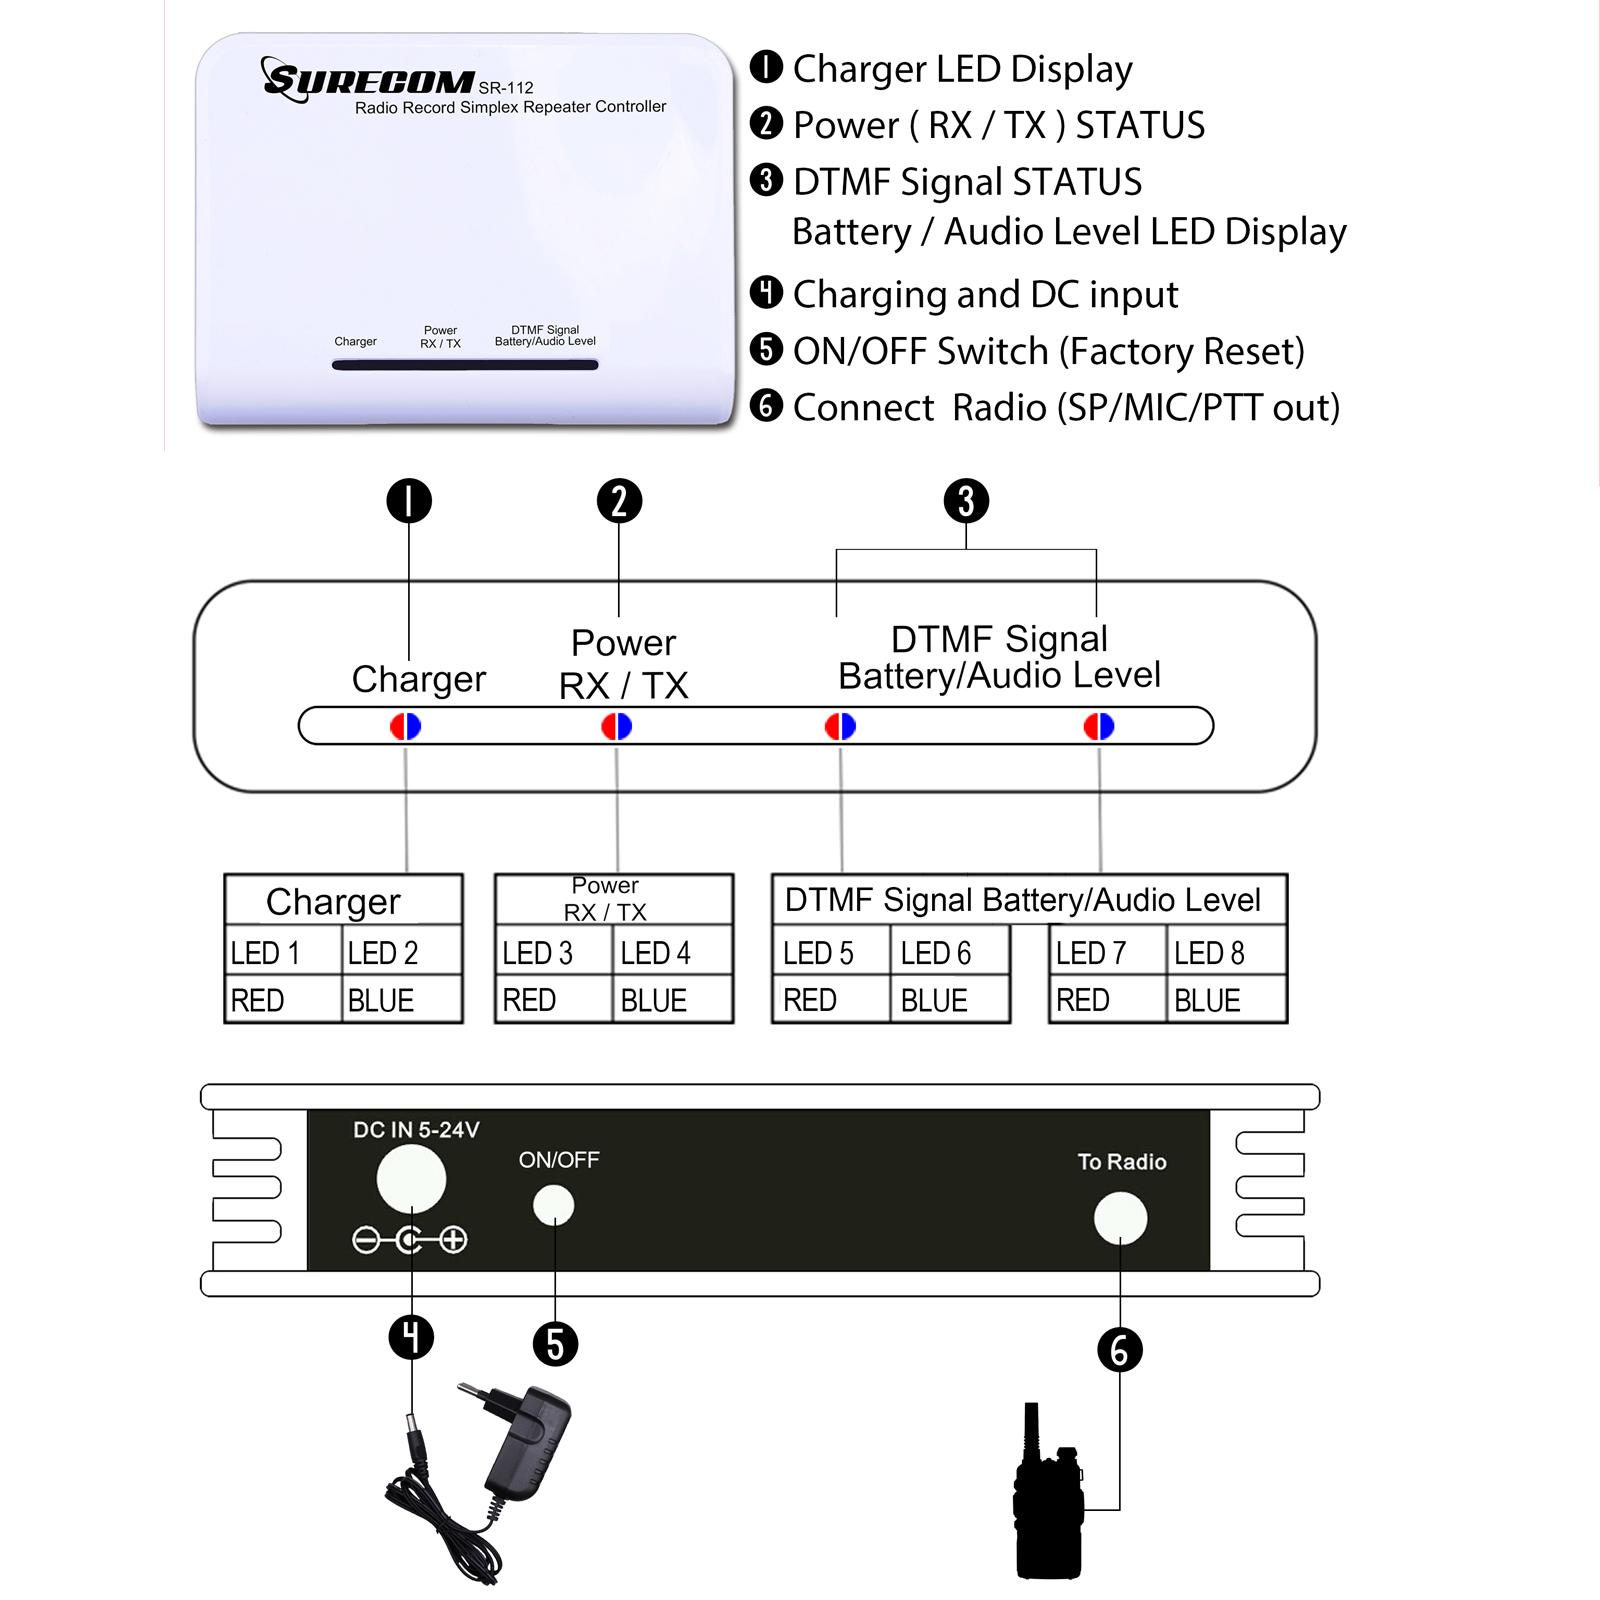 Surecom Sr 112 Simplex Repeater Controller With Diy Cable 409shop Wiring Diagram 409shopwalkie Talkiehandheld Transceiver Radio